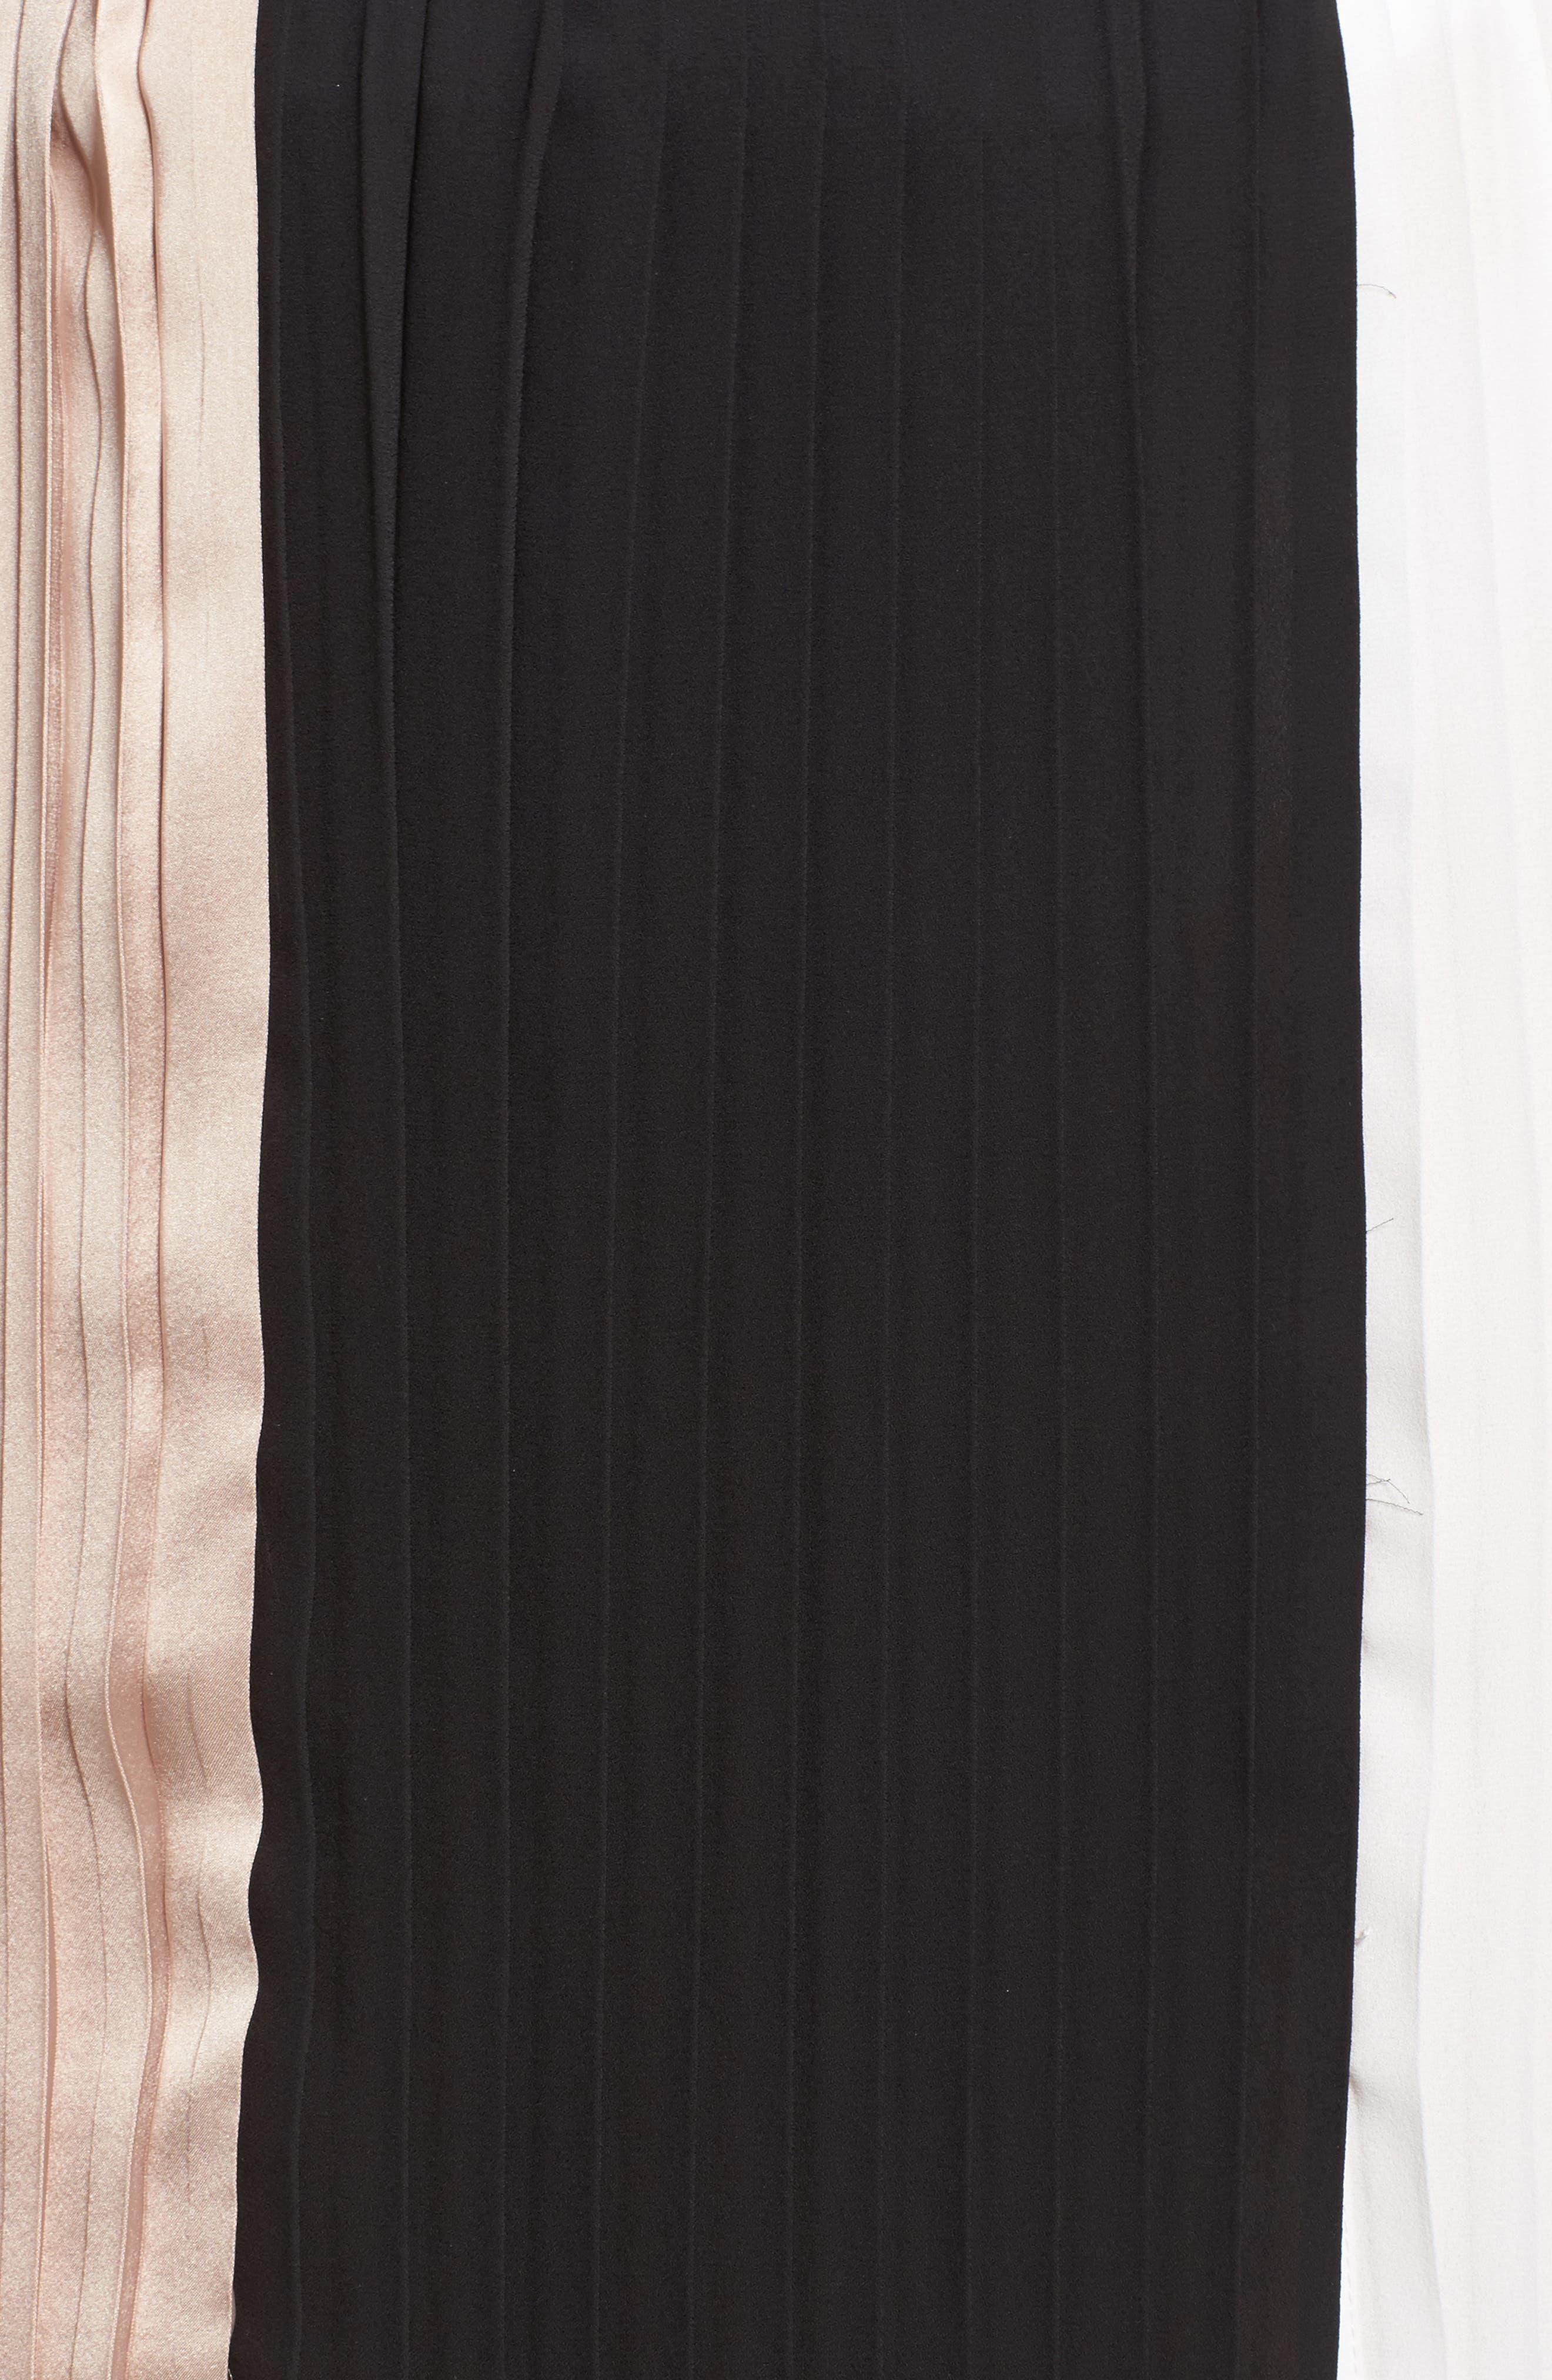 Colorblock Pleat Skirt,                             Alternate thumbnail 5, color,                             003